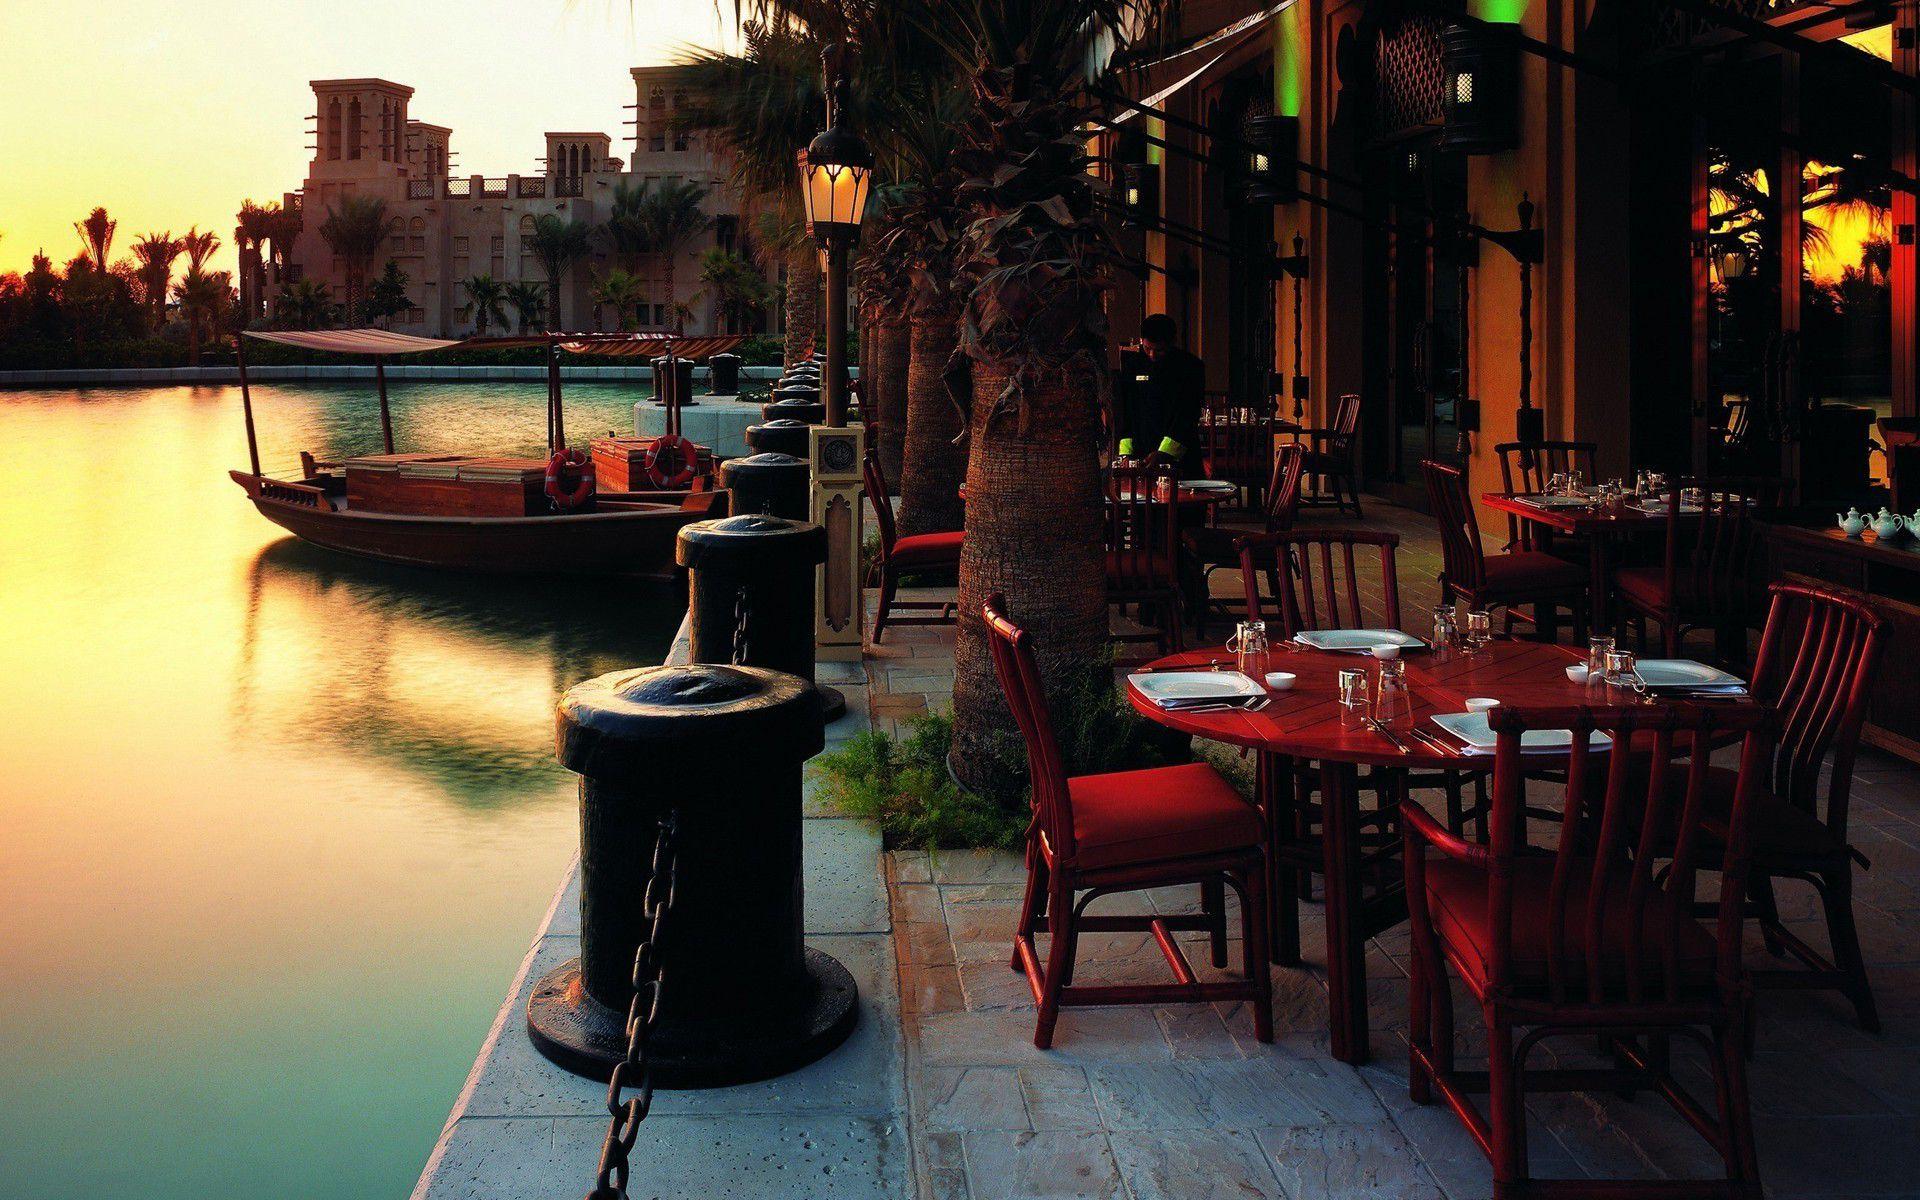 sidewalk cafe in venice - Bing Images   Outdoor restaurant ...